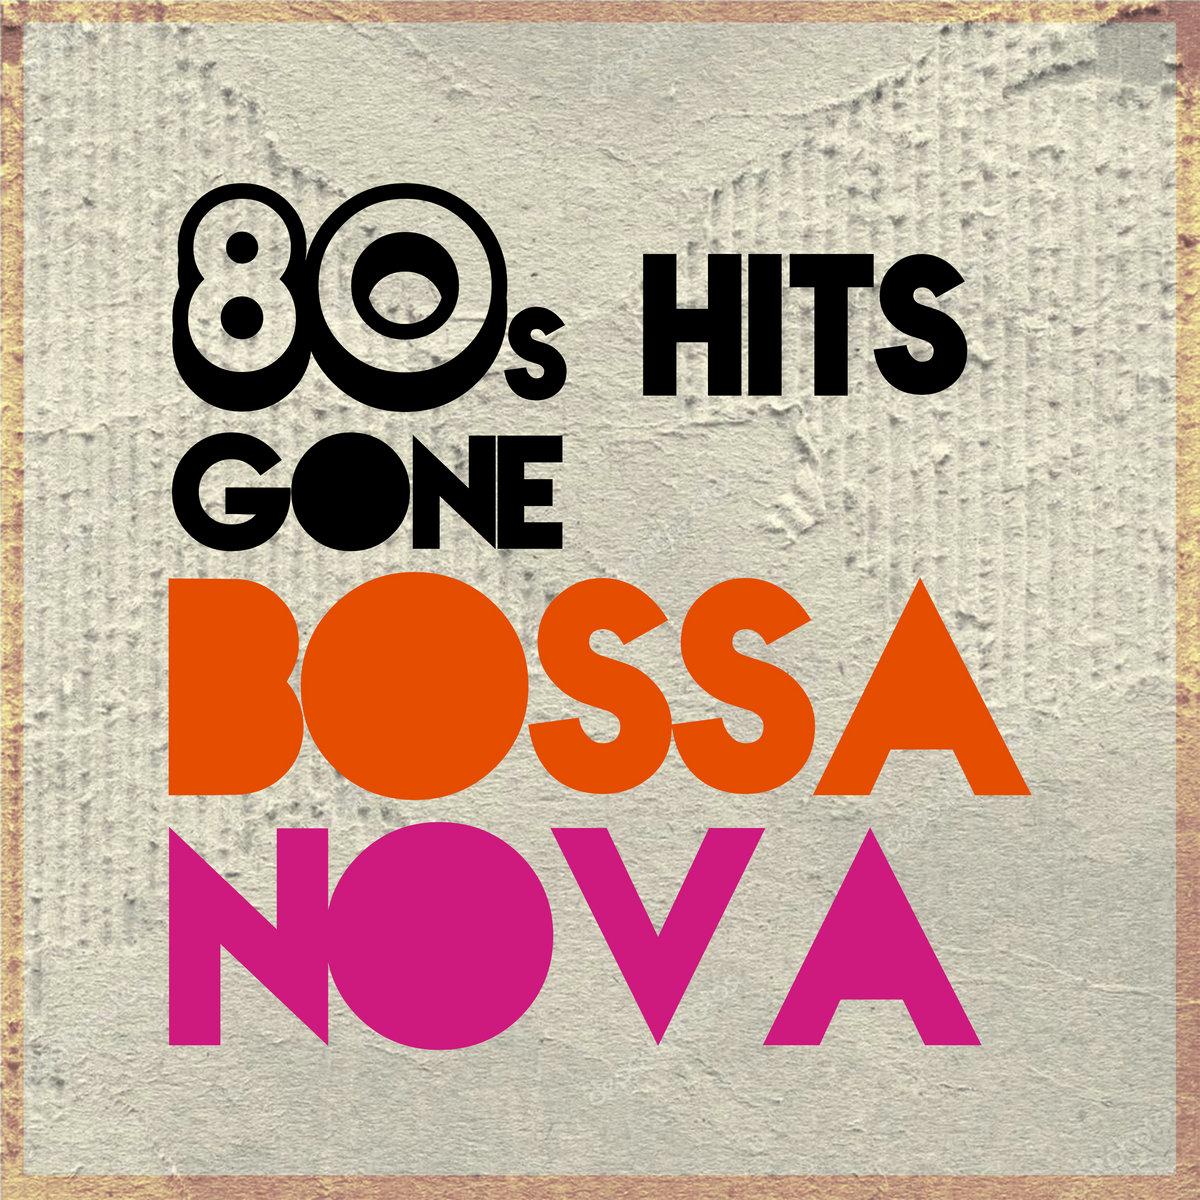 80s Hits Gone Bossa Nova (EP) | Minimatic